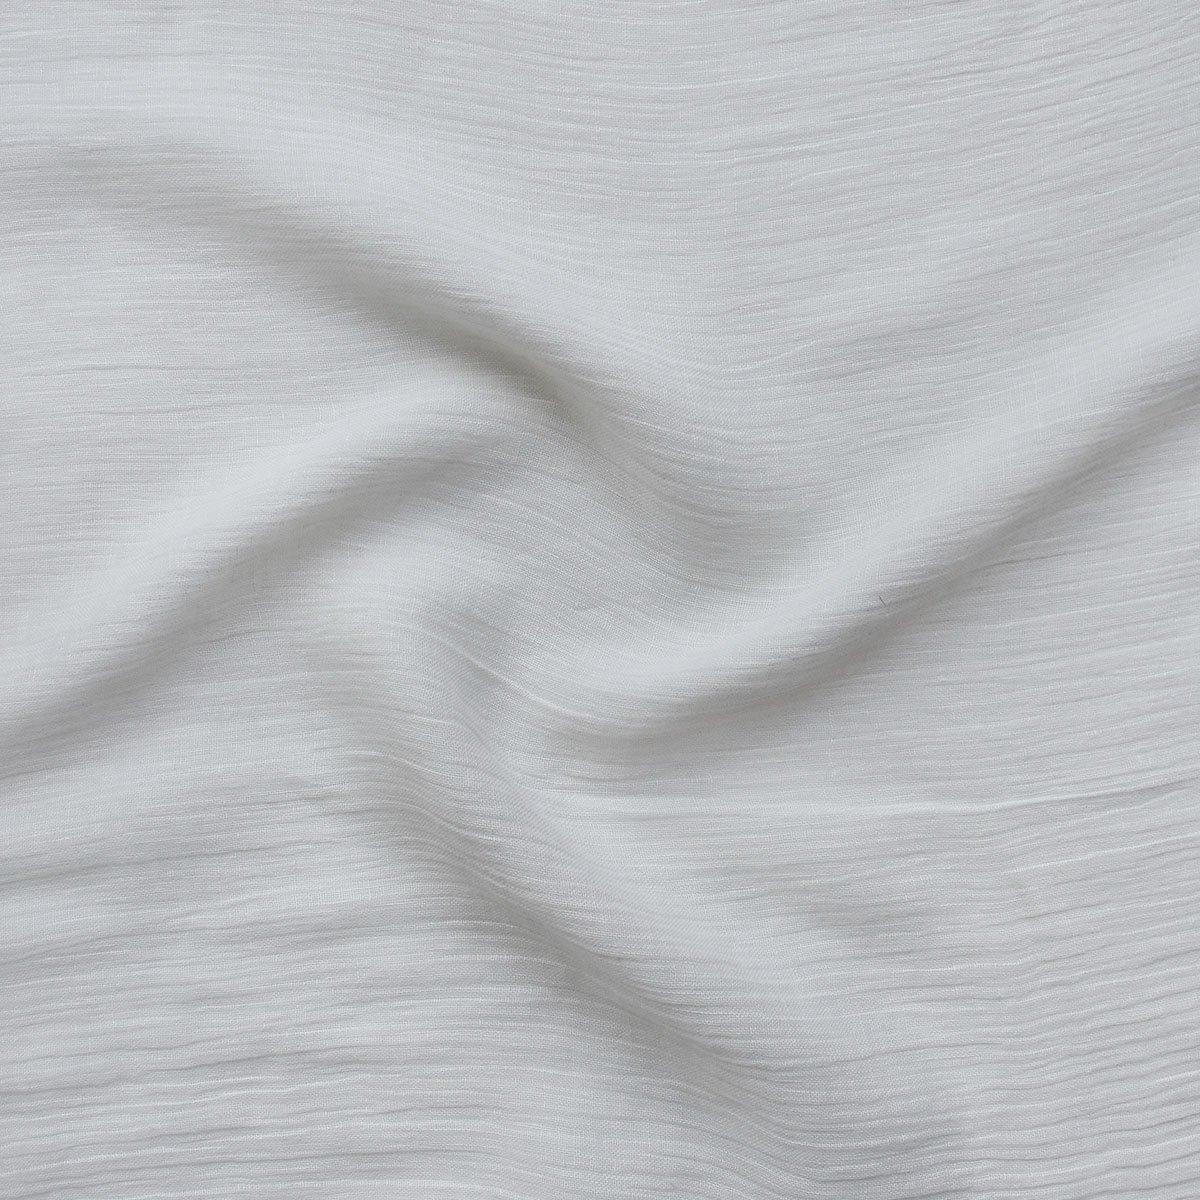 Linen Gauze - Ivory